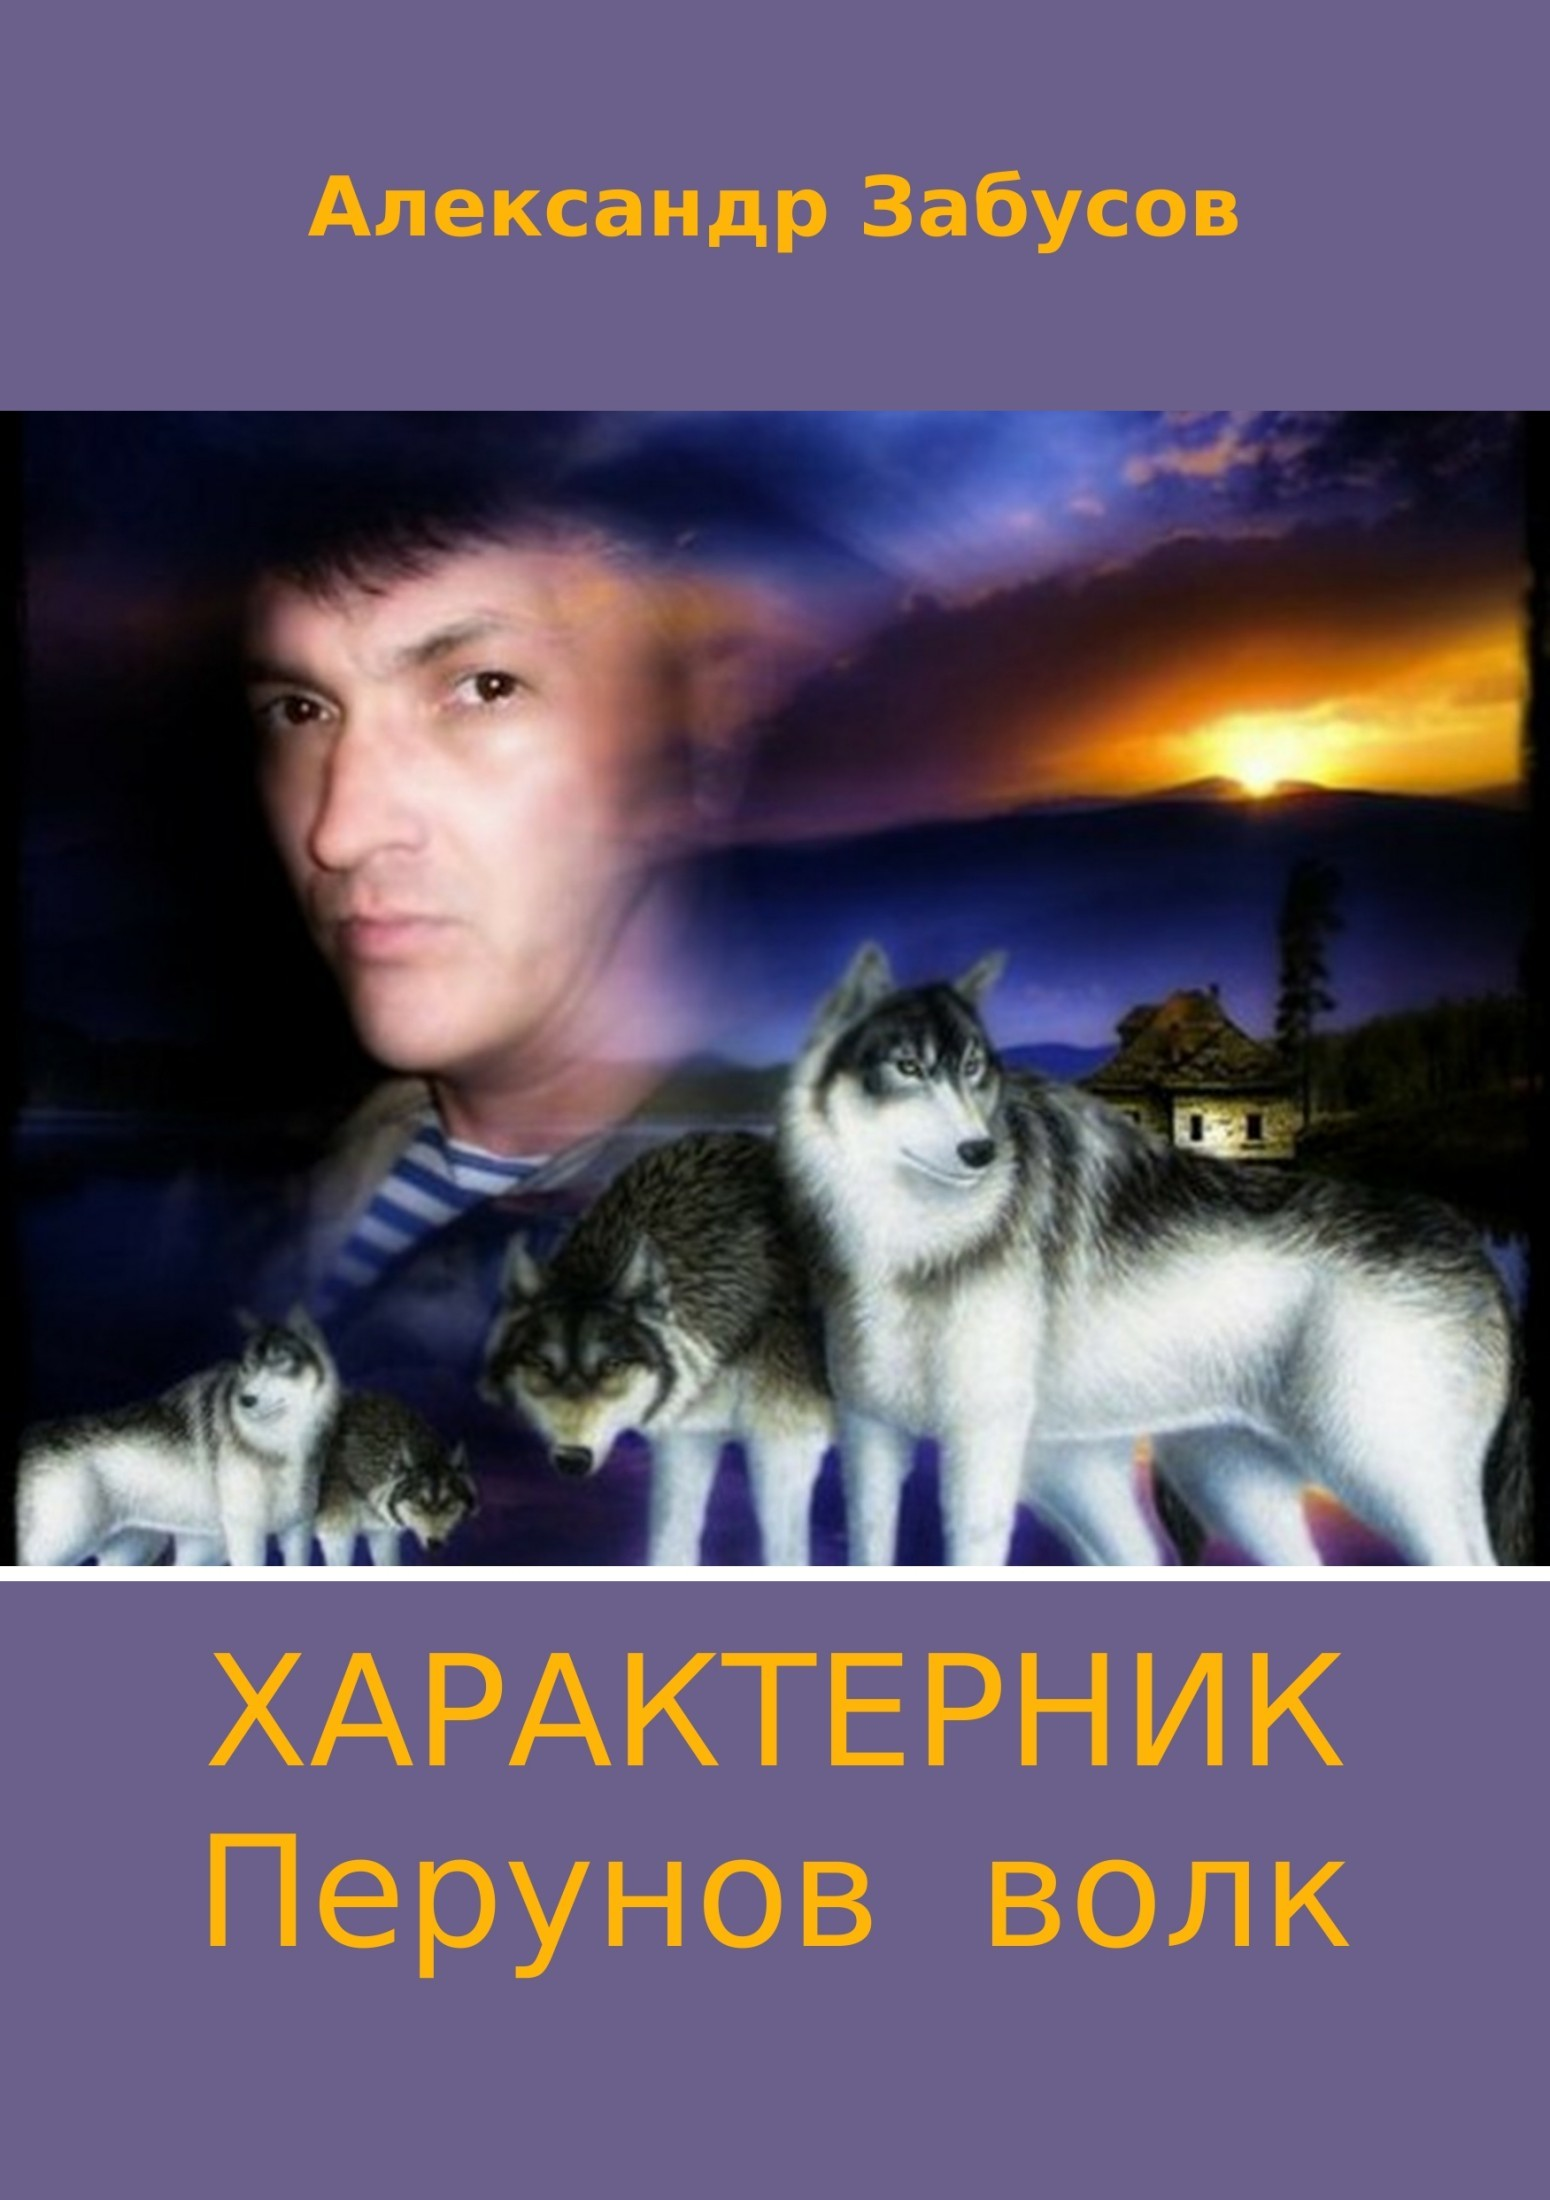 Александр Владимирович Забусов бесплатно